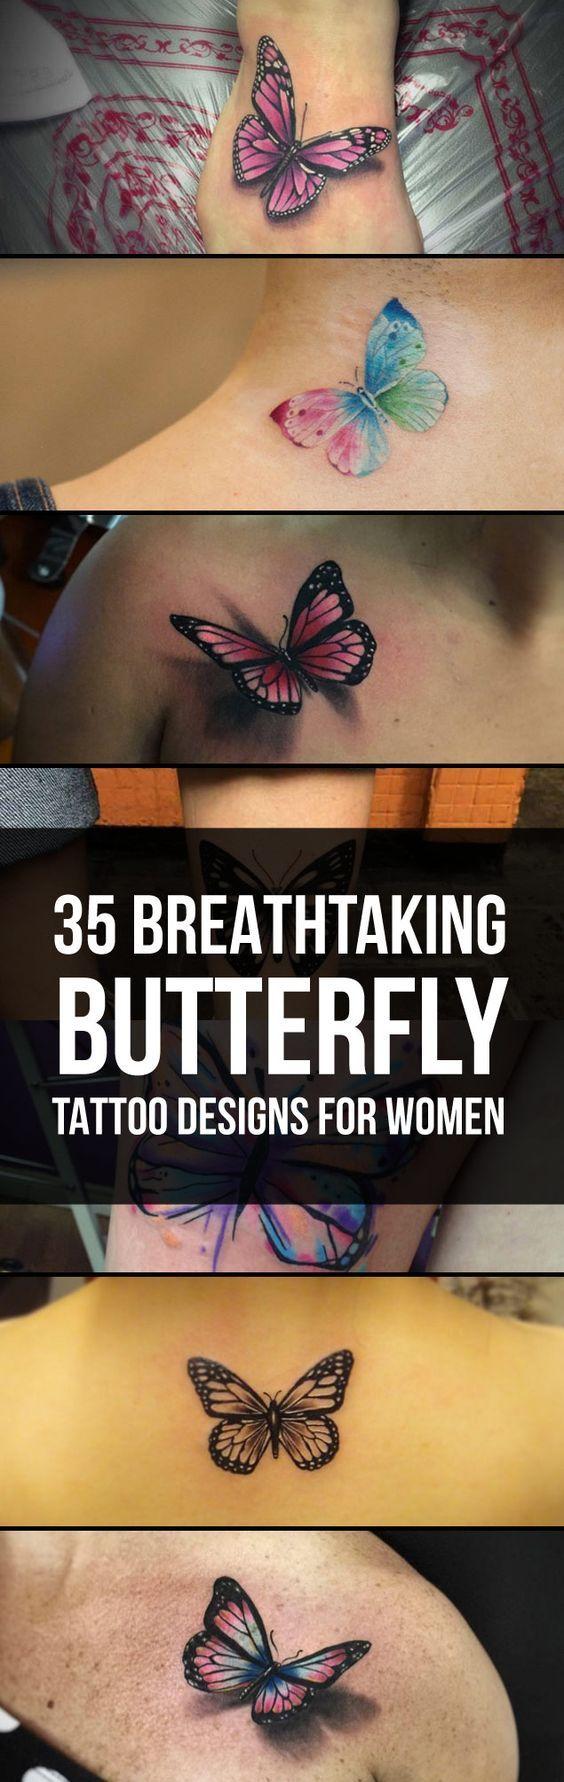 Breathtaking Butterfly Tattoo Designs | TattooBlend